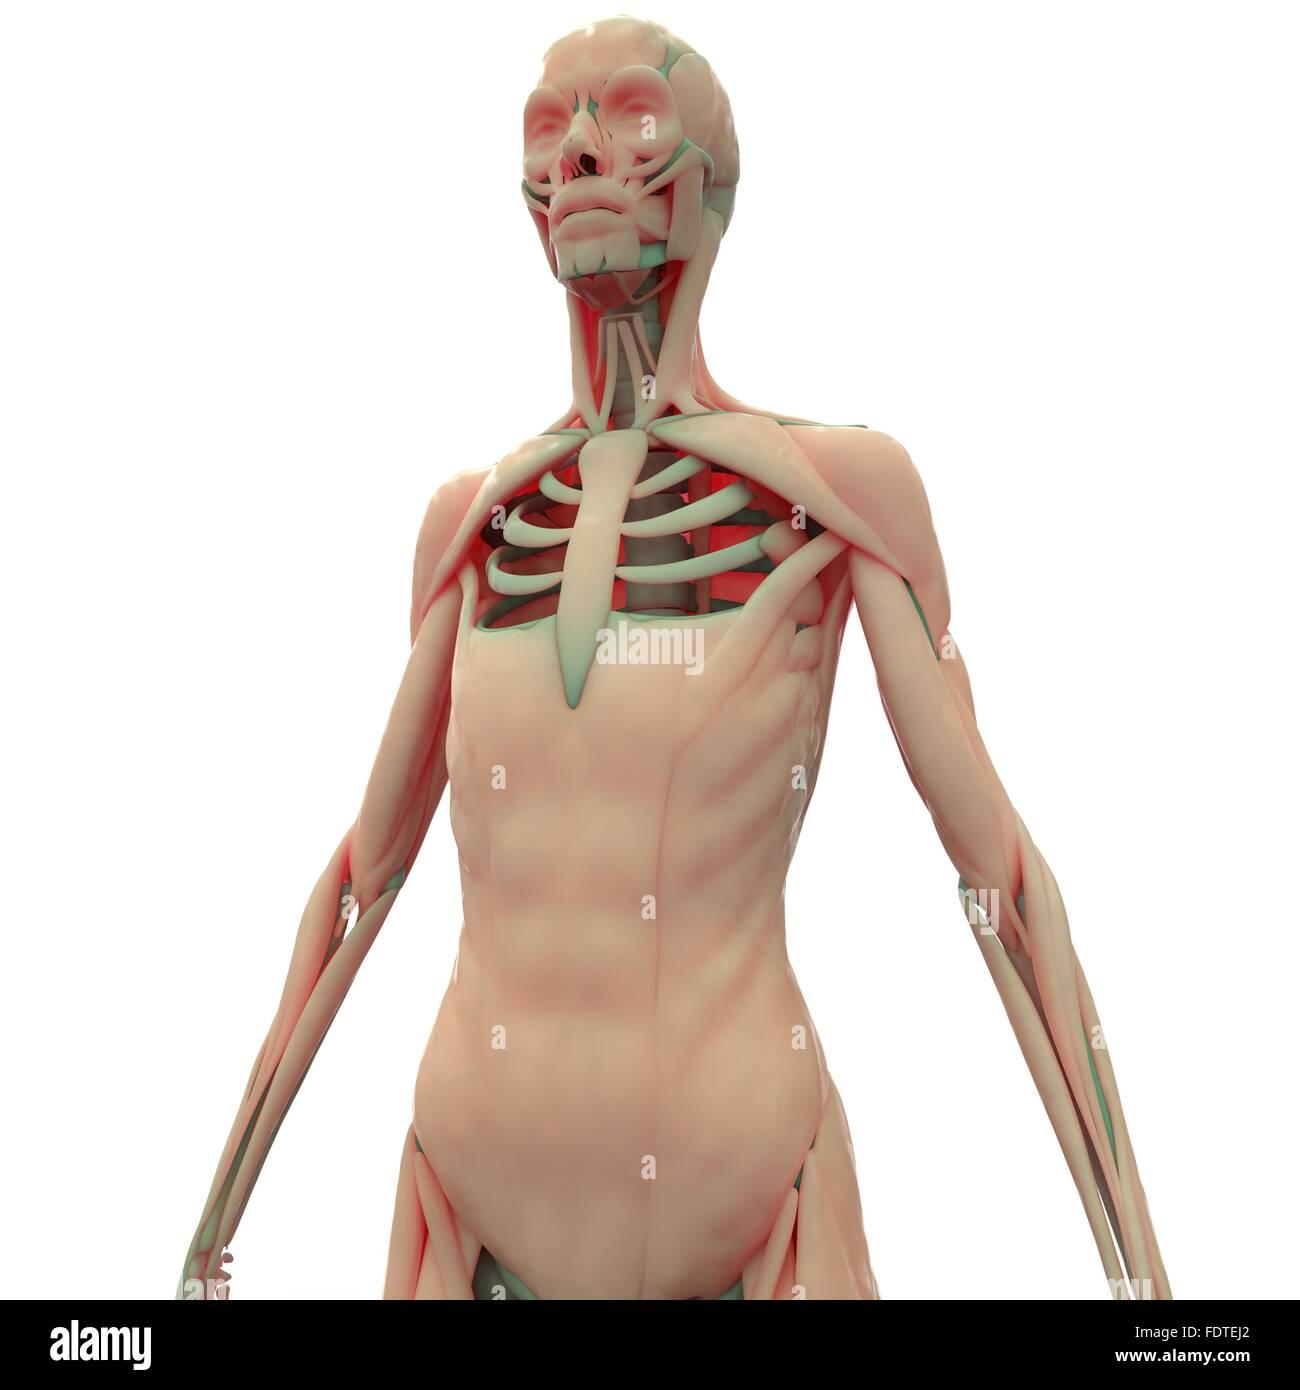 Human Body Muscles Anatomy Stock Photo 94580698 Alamy